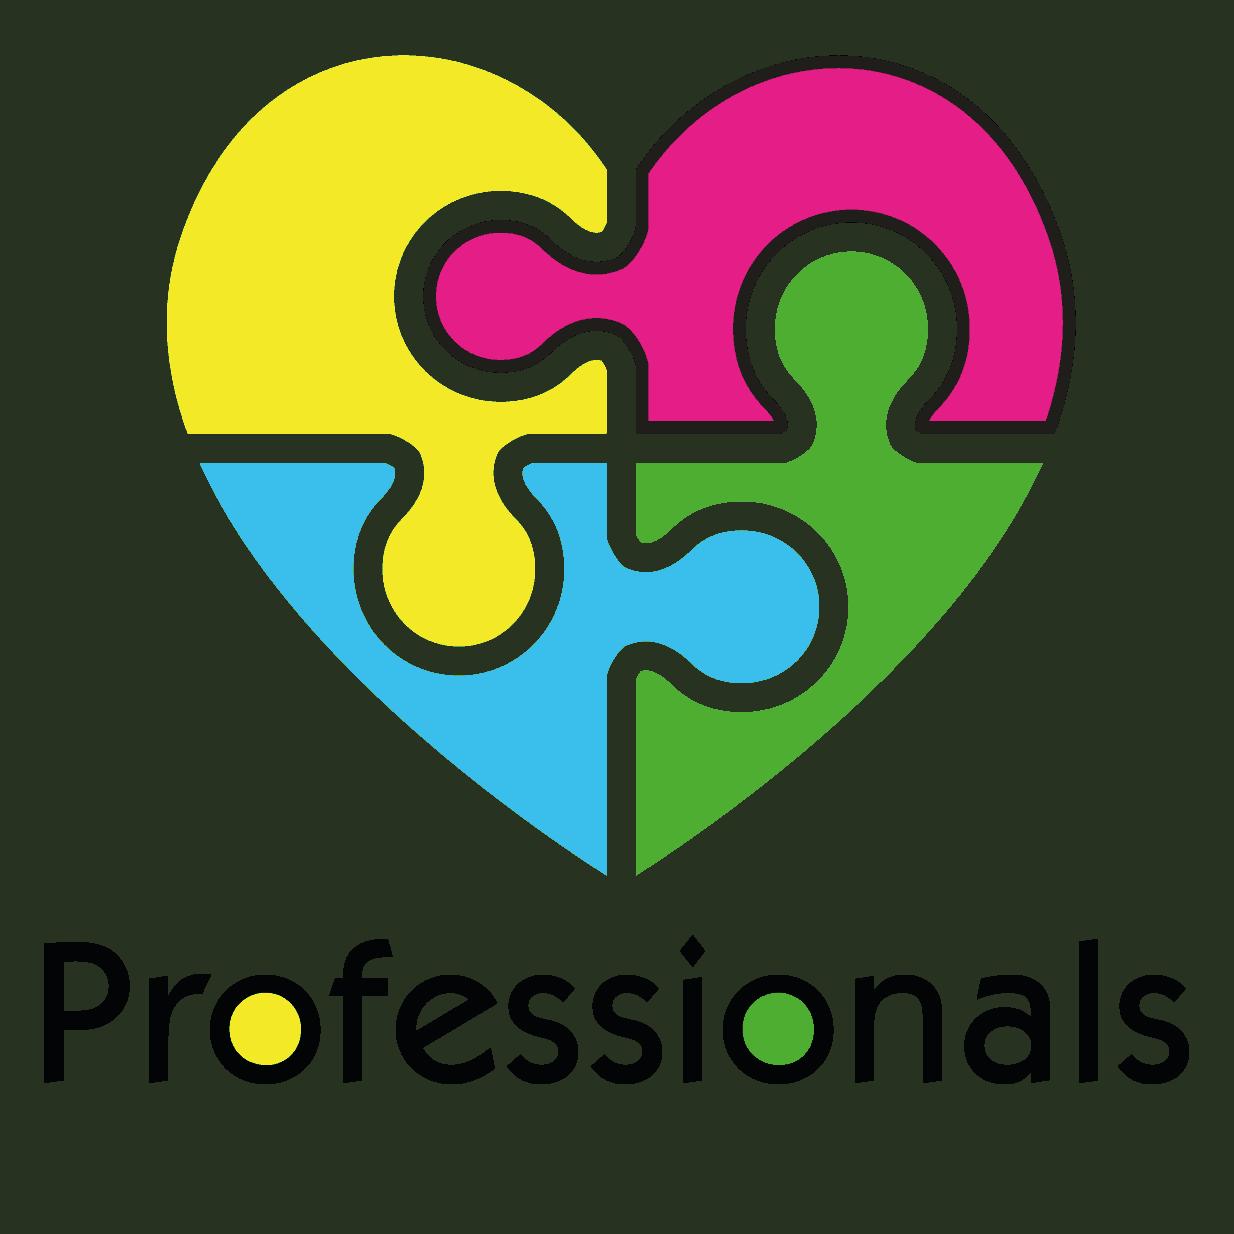 Suzanne_Stikvoort_Professionals